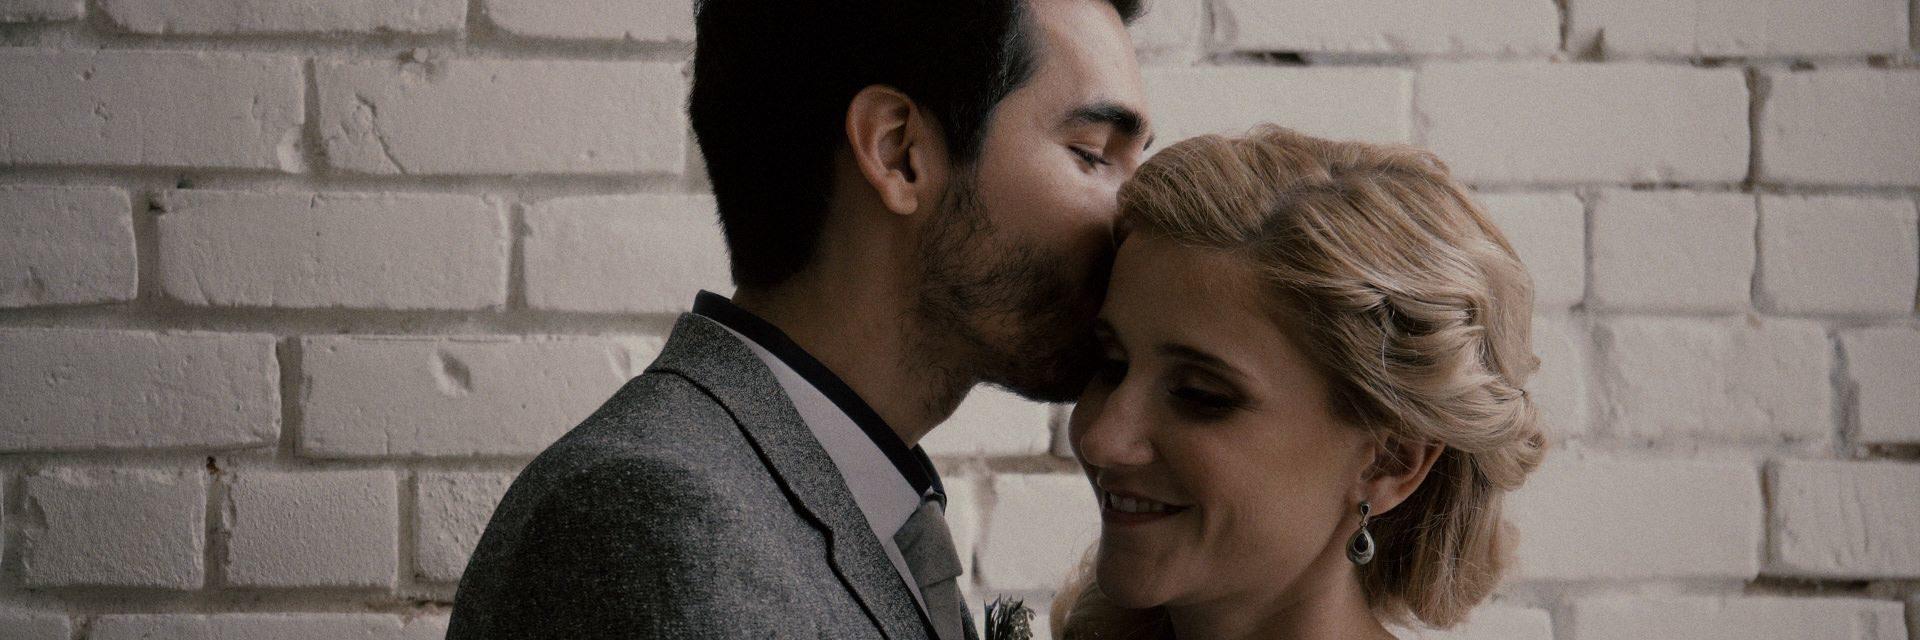 Skogafoss-wedding-videographer-cinemate-films-03